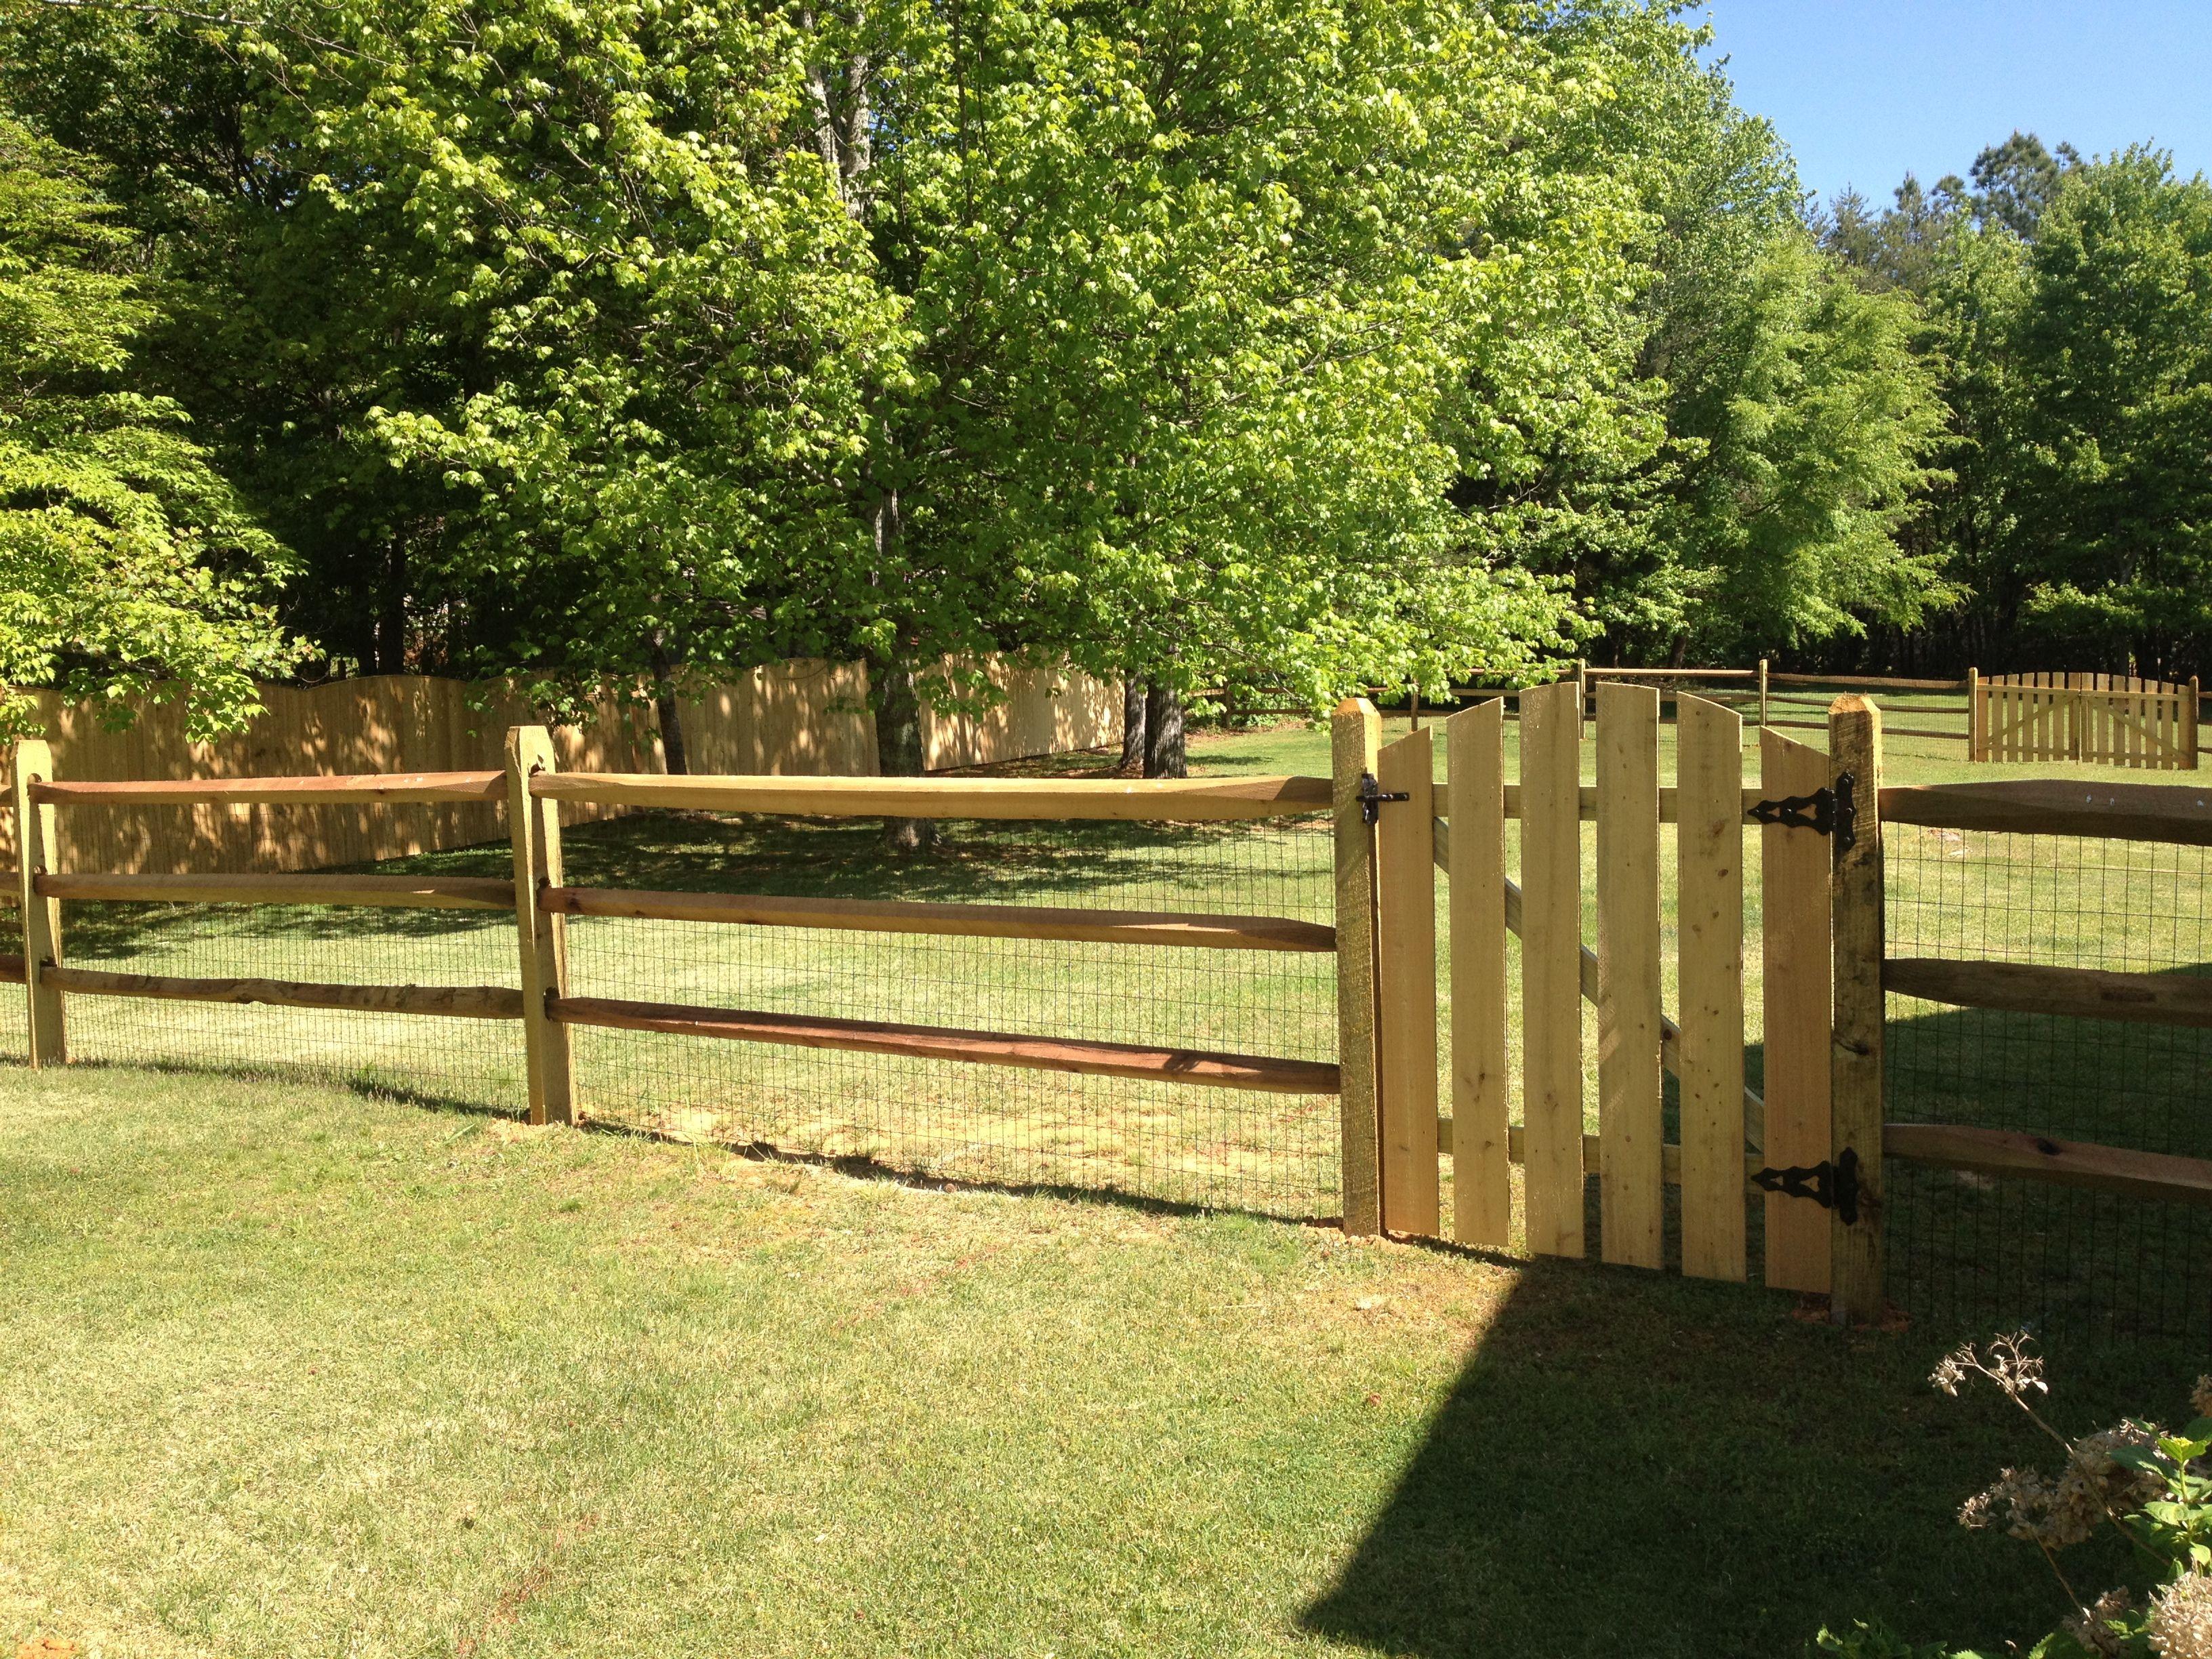 wooden farm fence. Wood Farm Fence Inspiration Ideas 22931 Decorating Wooden